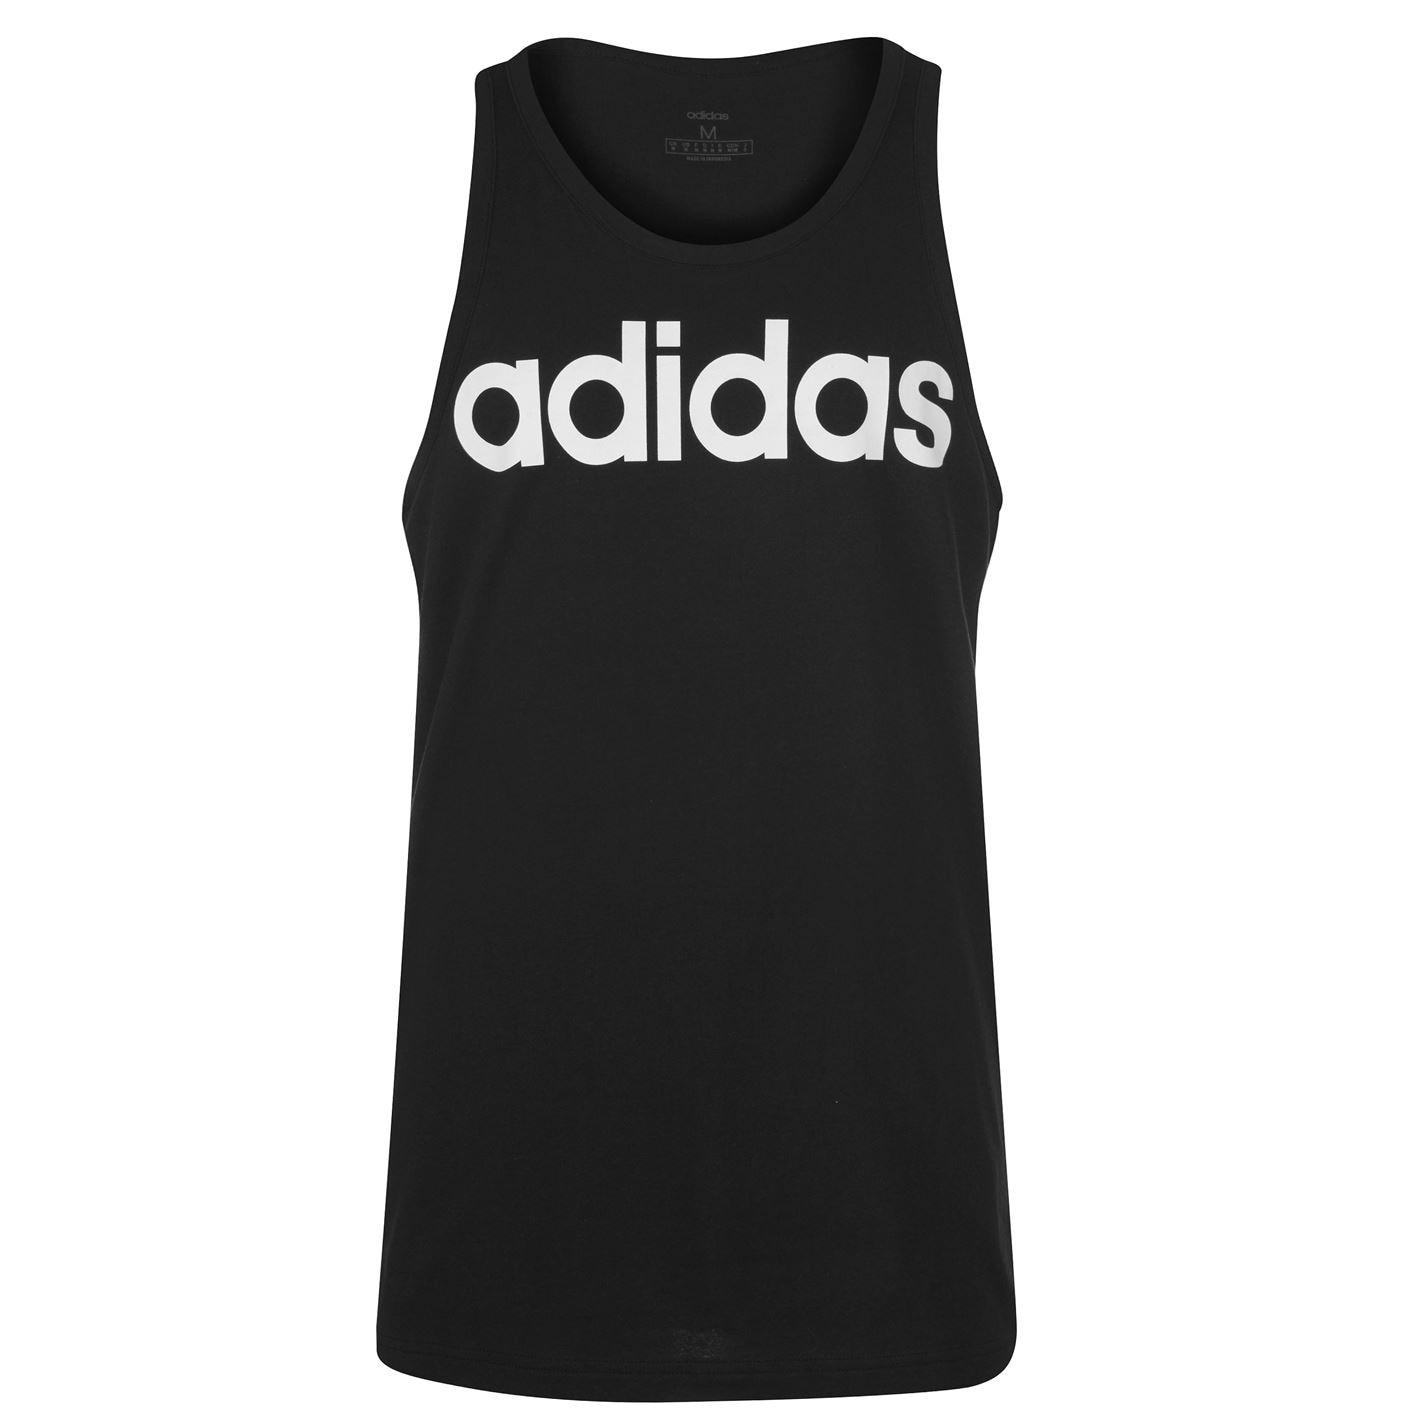 Adidas Mens Graphic Tank Top